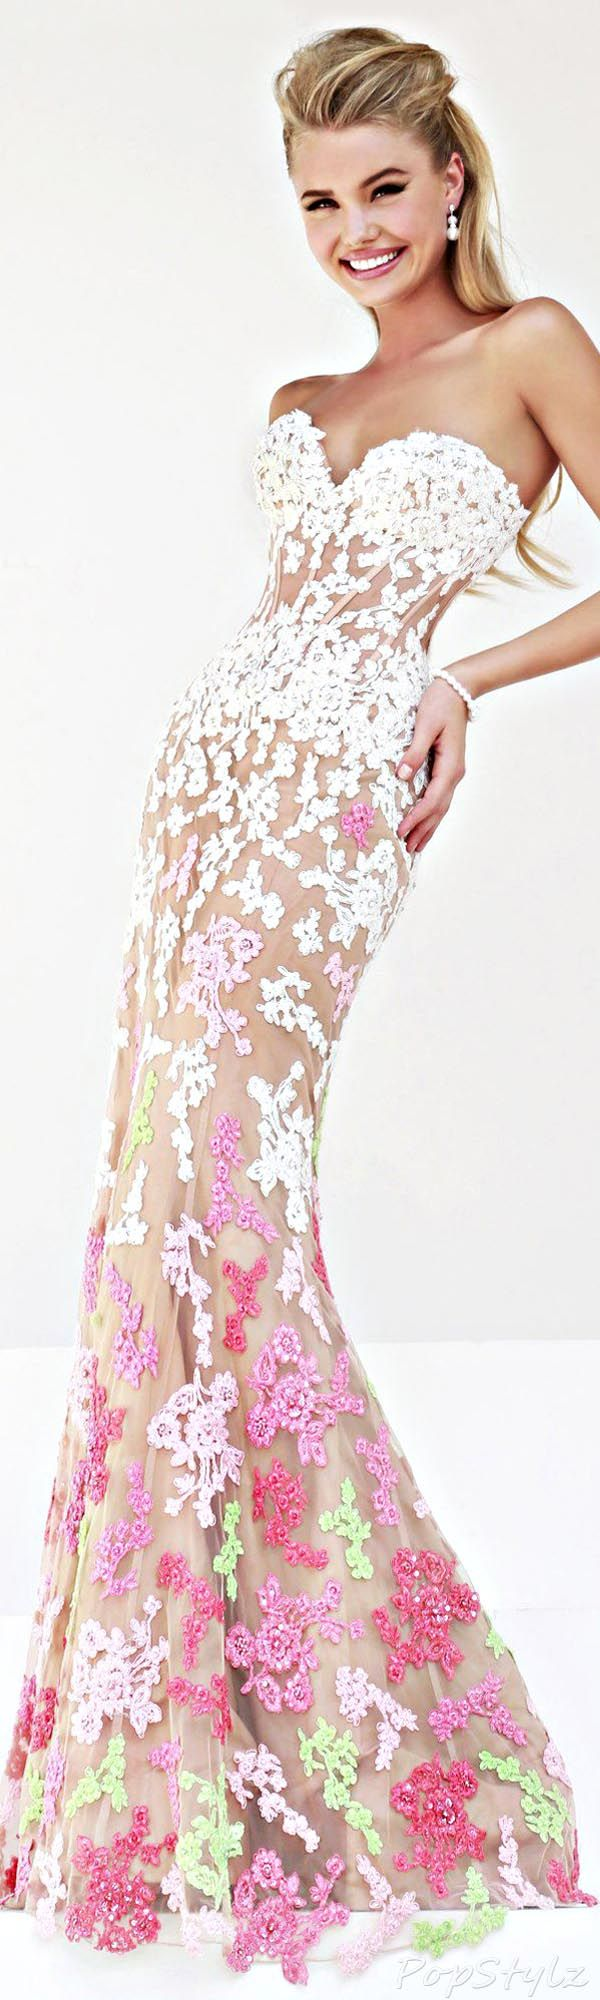 Bridal Wedding Dresses Spring 2015